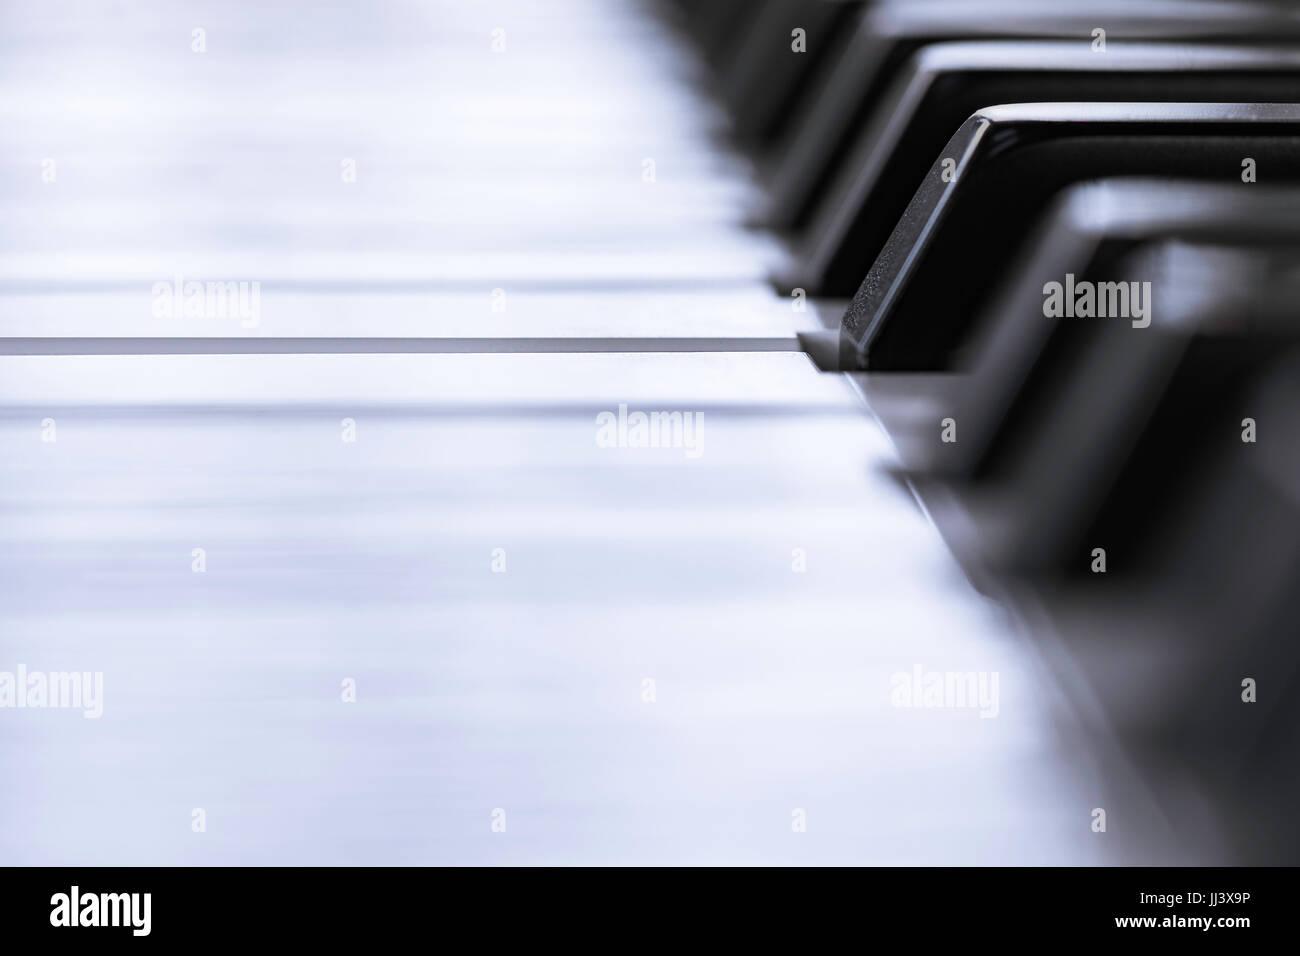 Modern piano keys - Stock Image